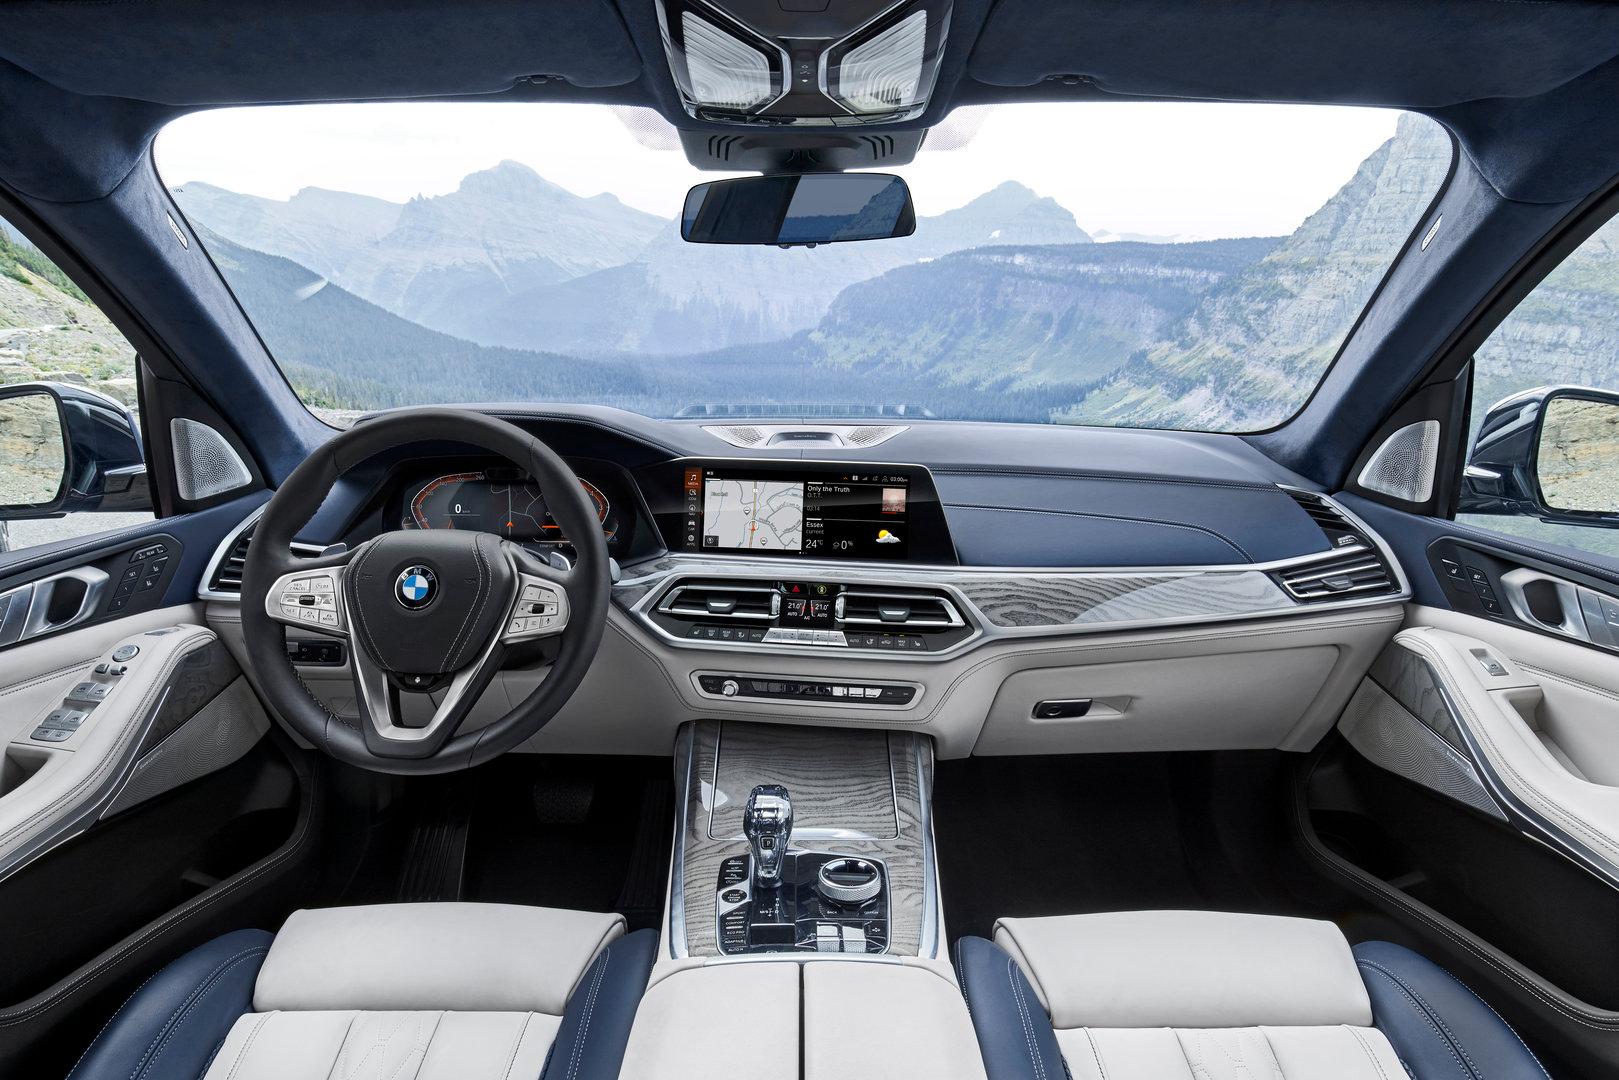 BMW X7 – Cockpit